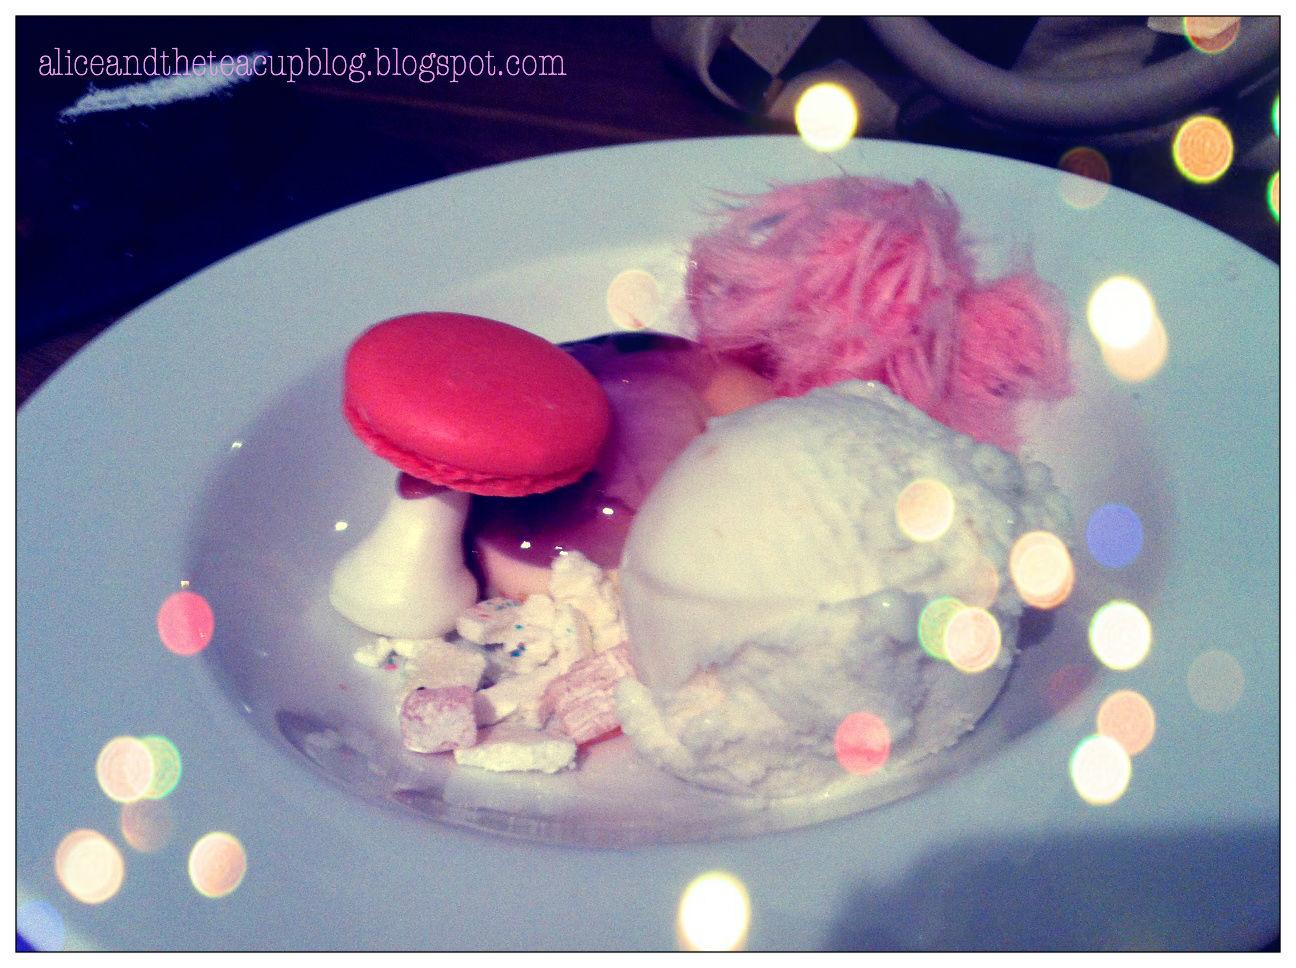 Aviary Dessert Kitchen Review